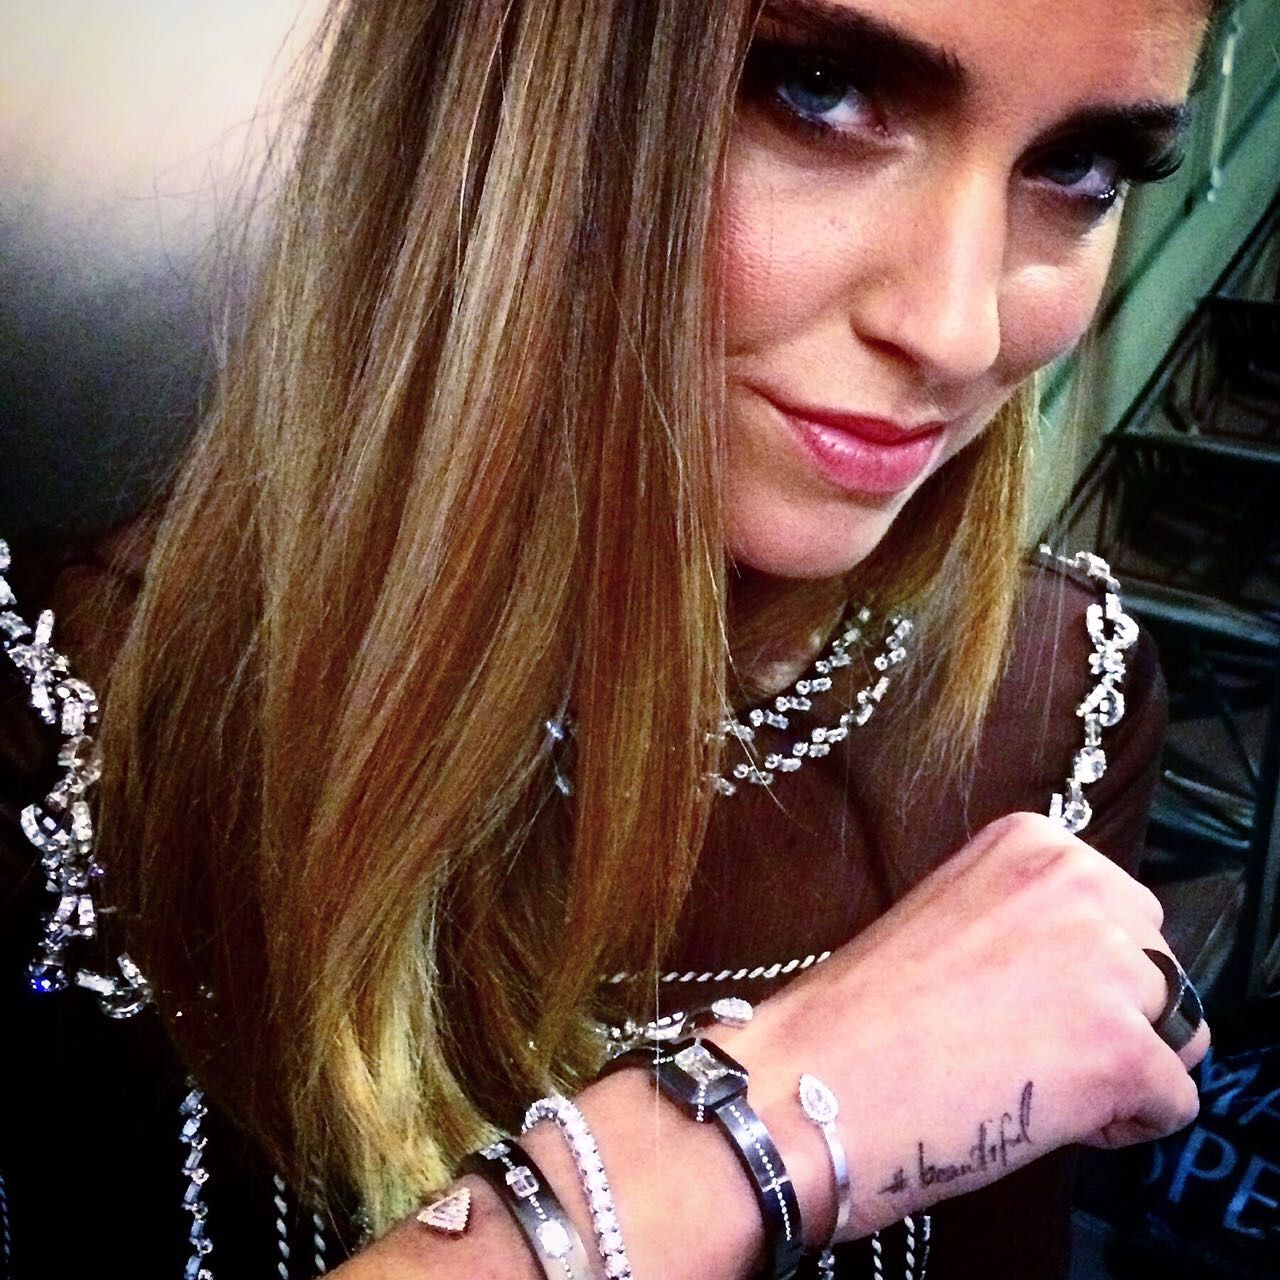 Chiara Ferragni in Danelian Diamonds.